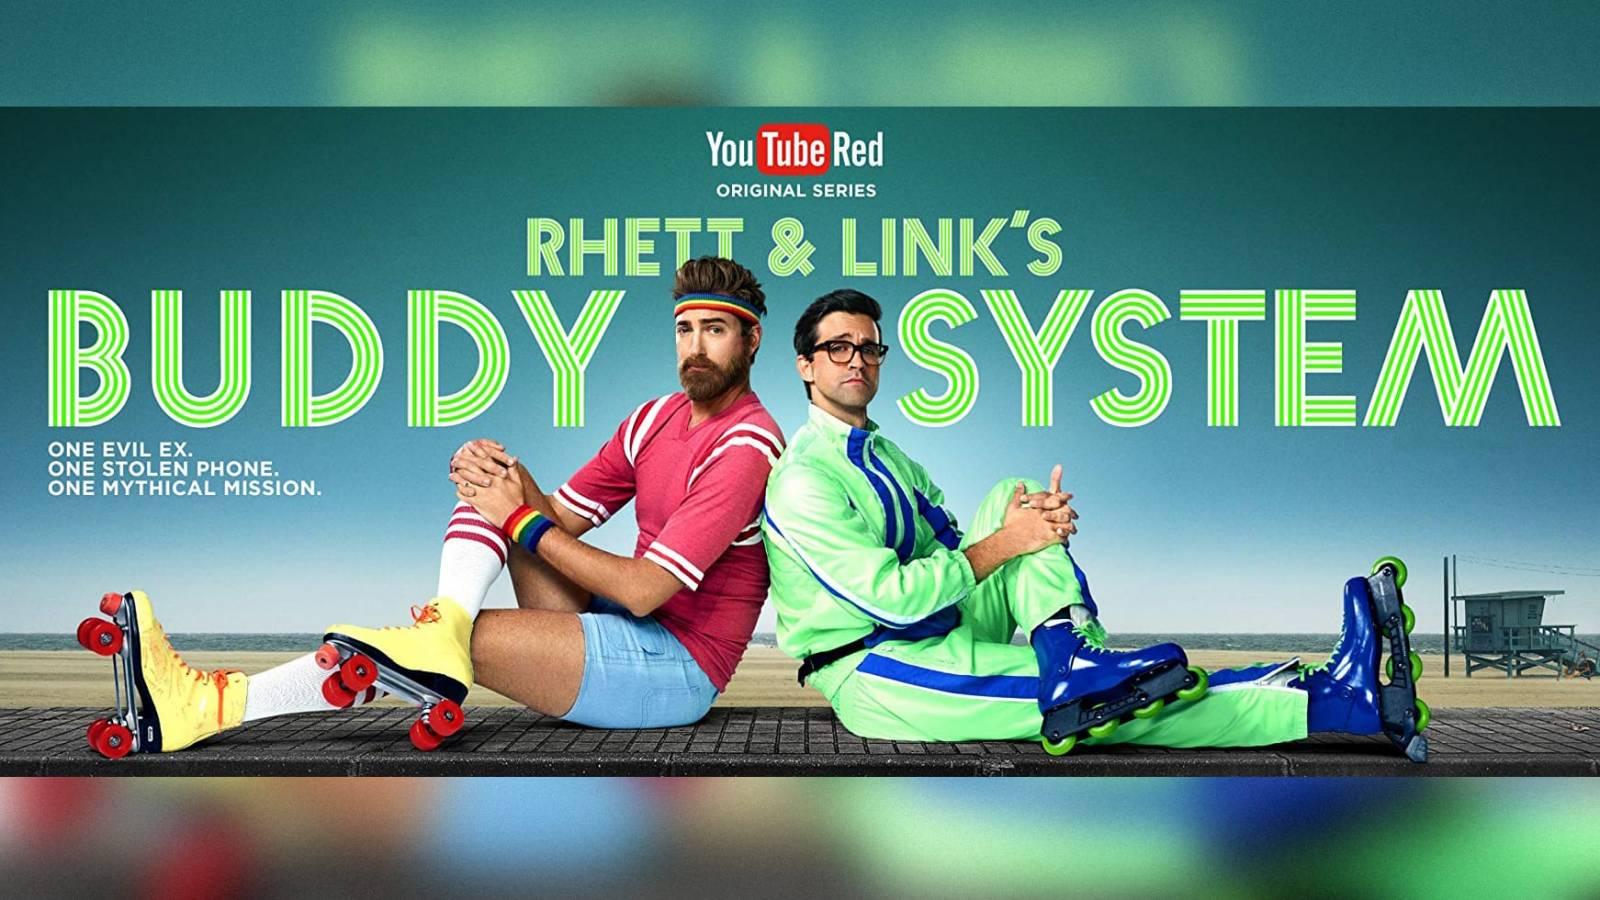 'Buddy System'